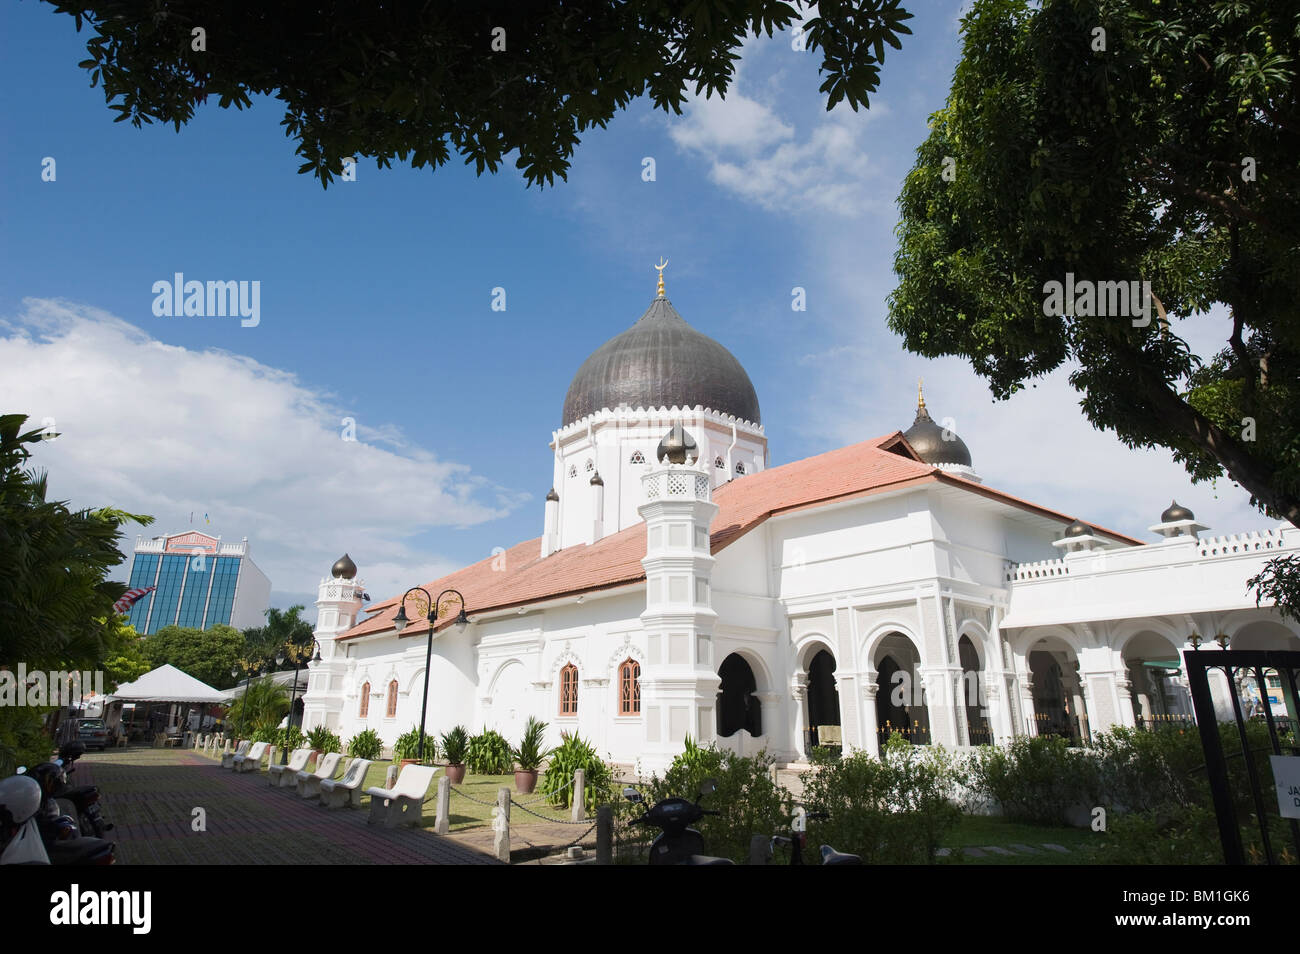 Masjid Kapitan Keling mosque, Georgetown, Penang, Malaysia, Southeast Asia, Asia - Stock Image